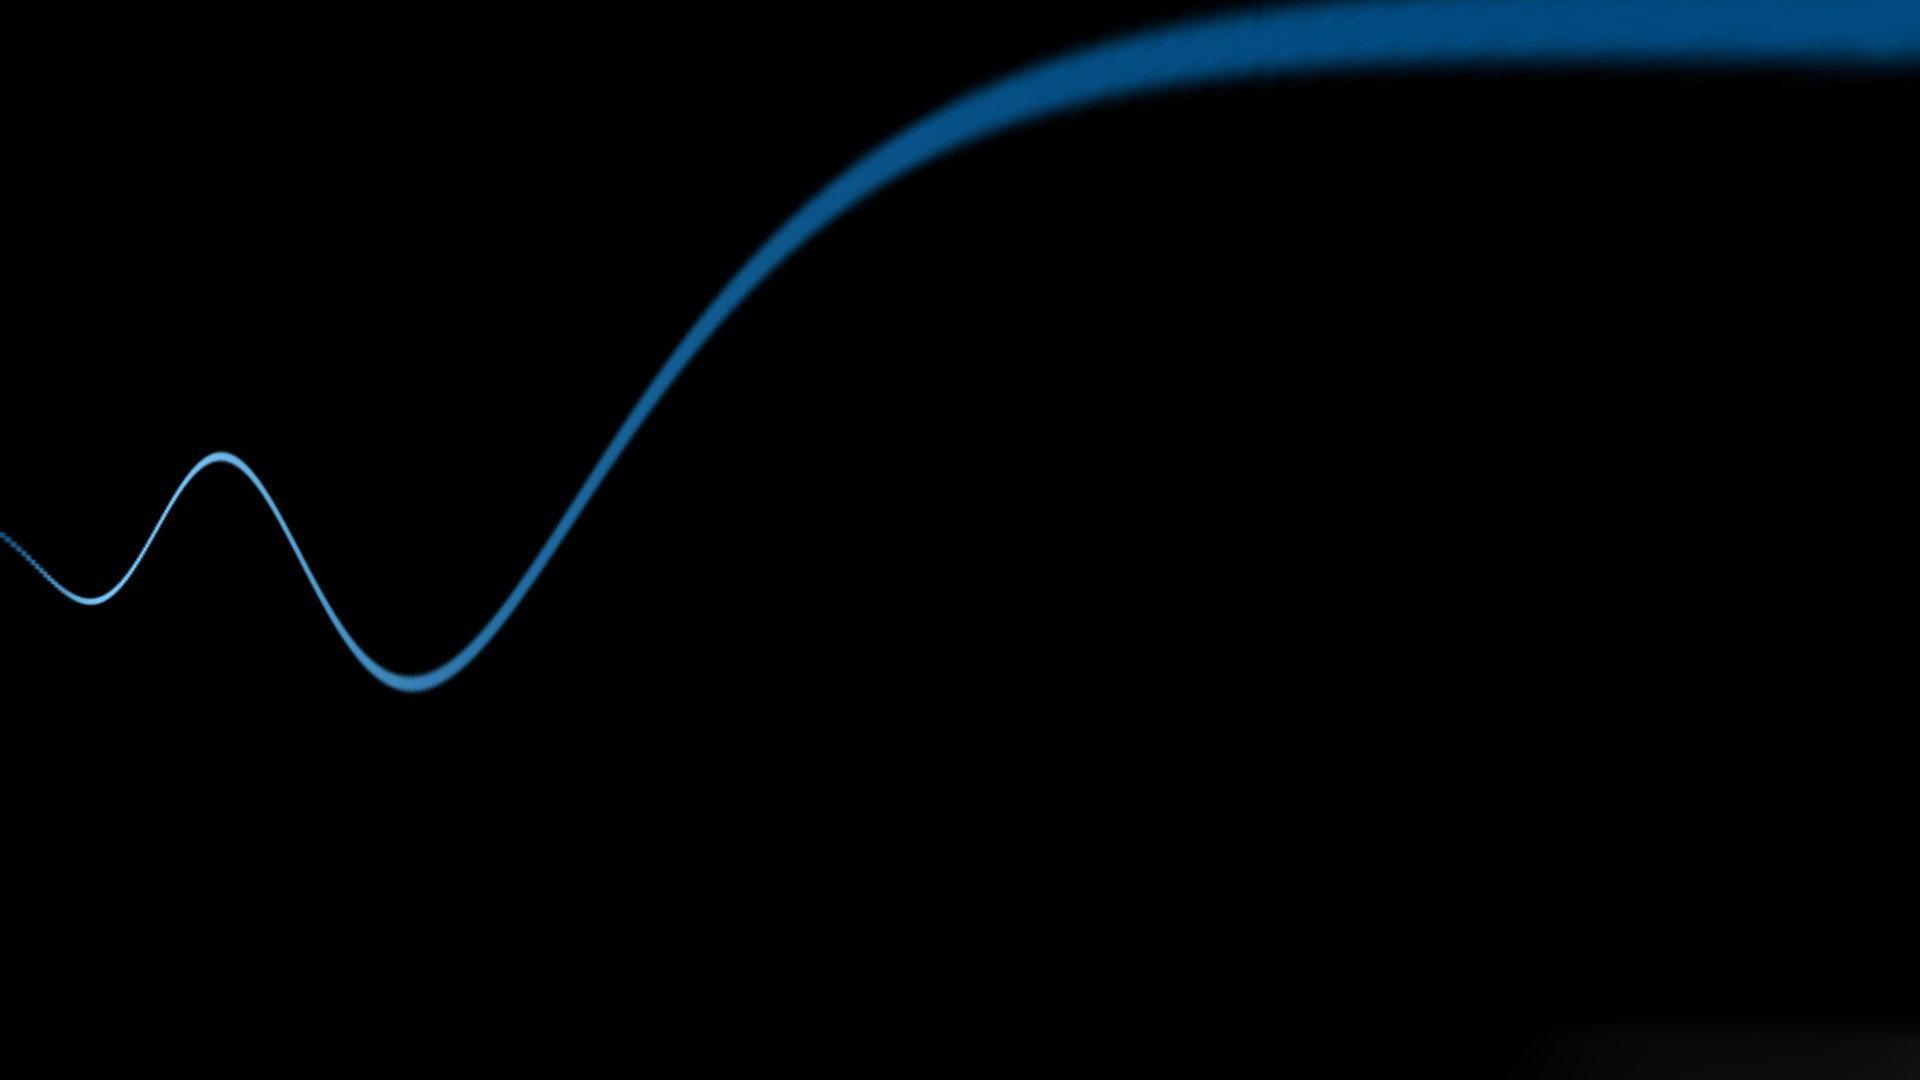 Free Download Black Background Id 54061 1080p For Desktop